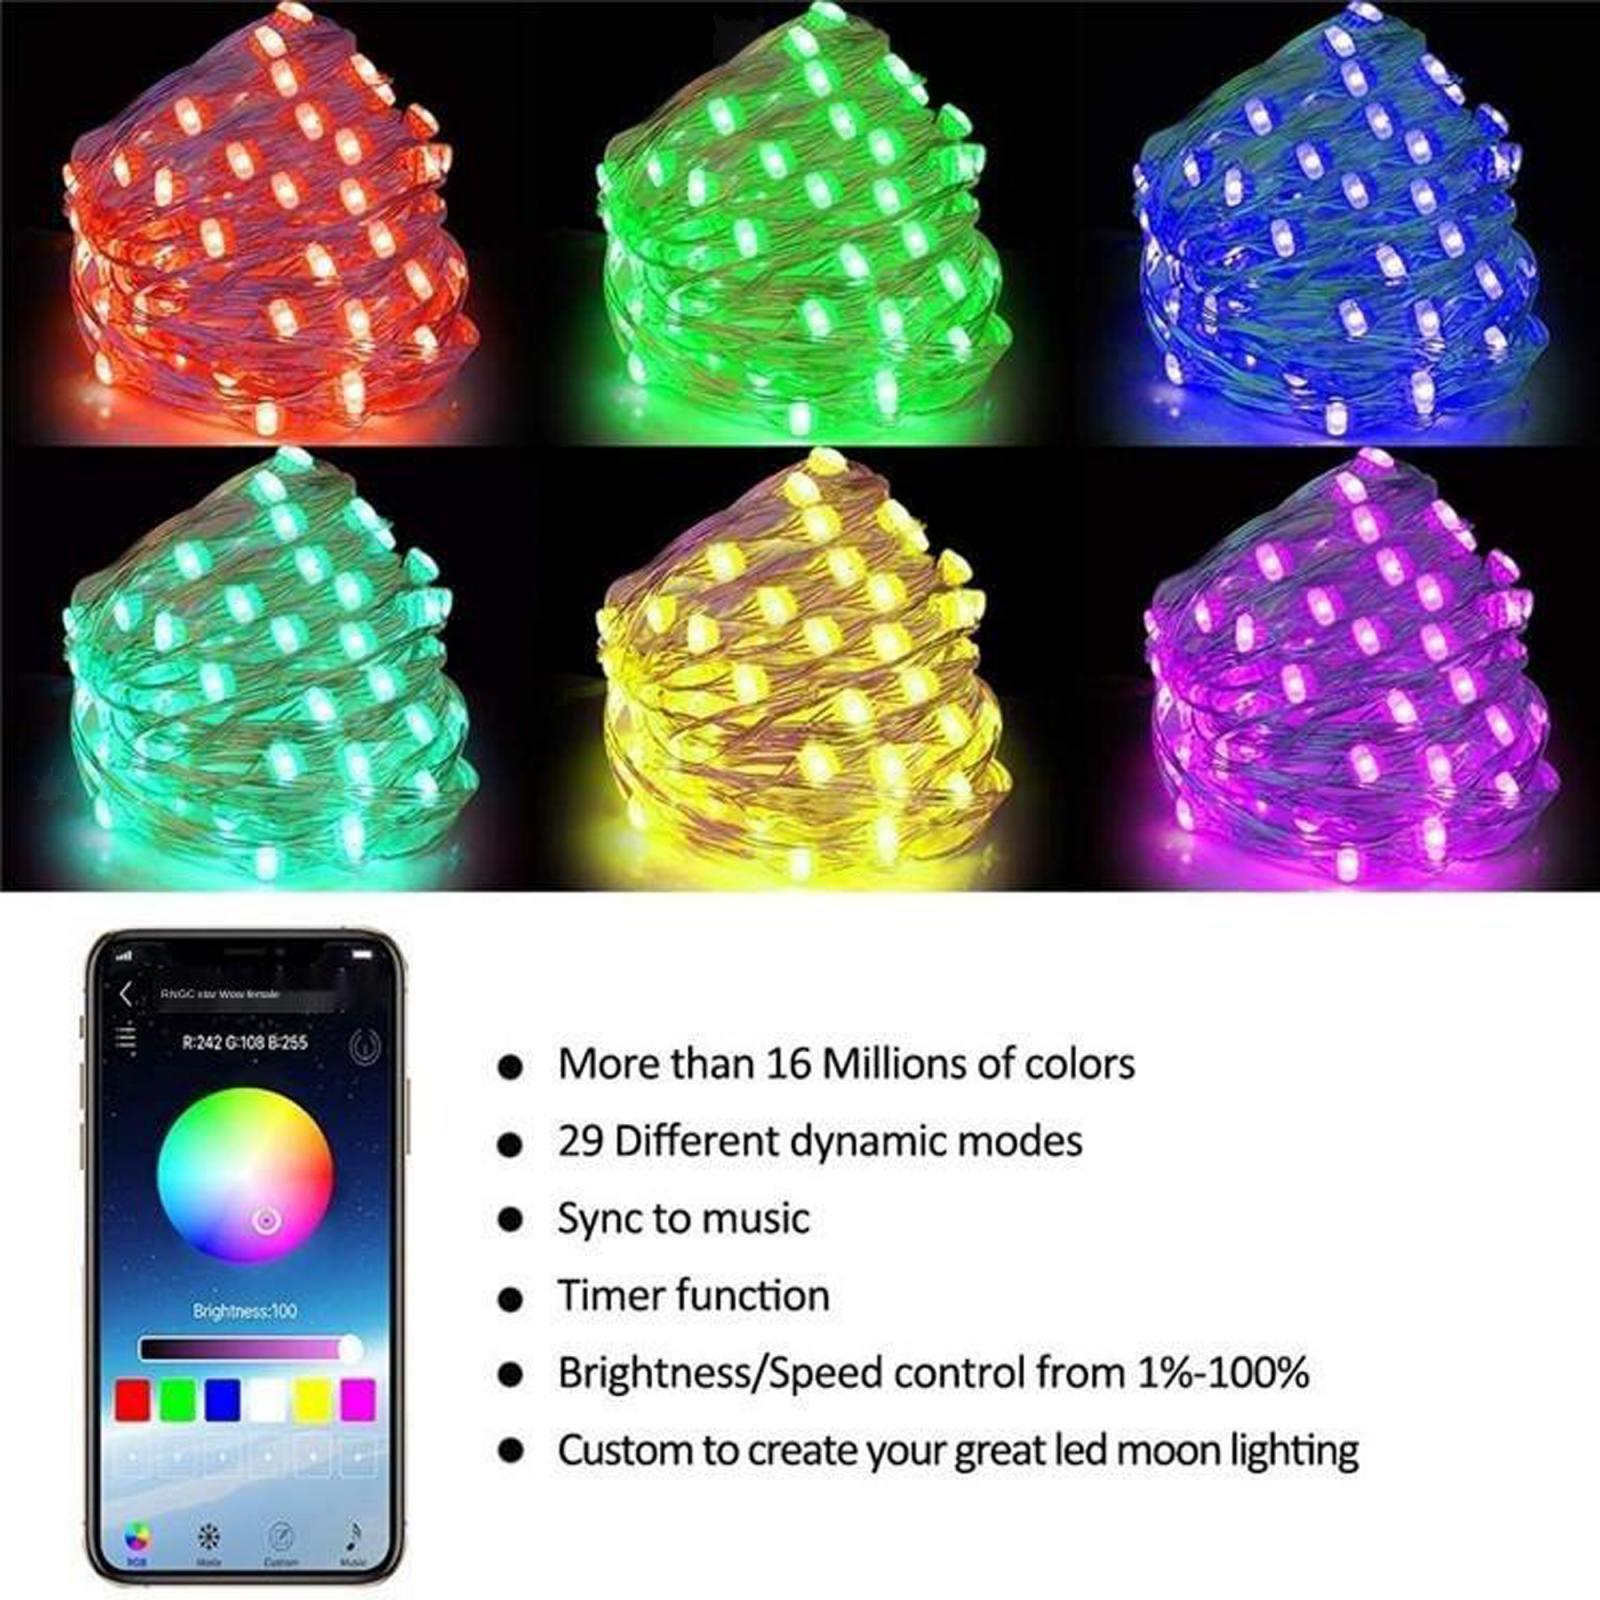 miniature 28 - LED Fée Guirlande Lumineuse Rideau Fenêtre De Mariage Party Decor App Contrôl